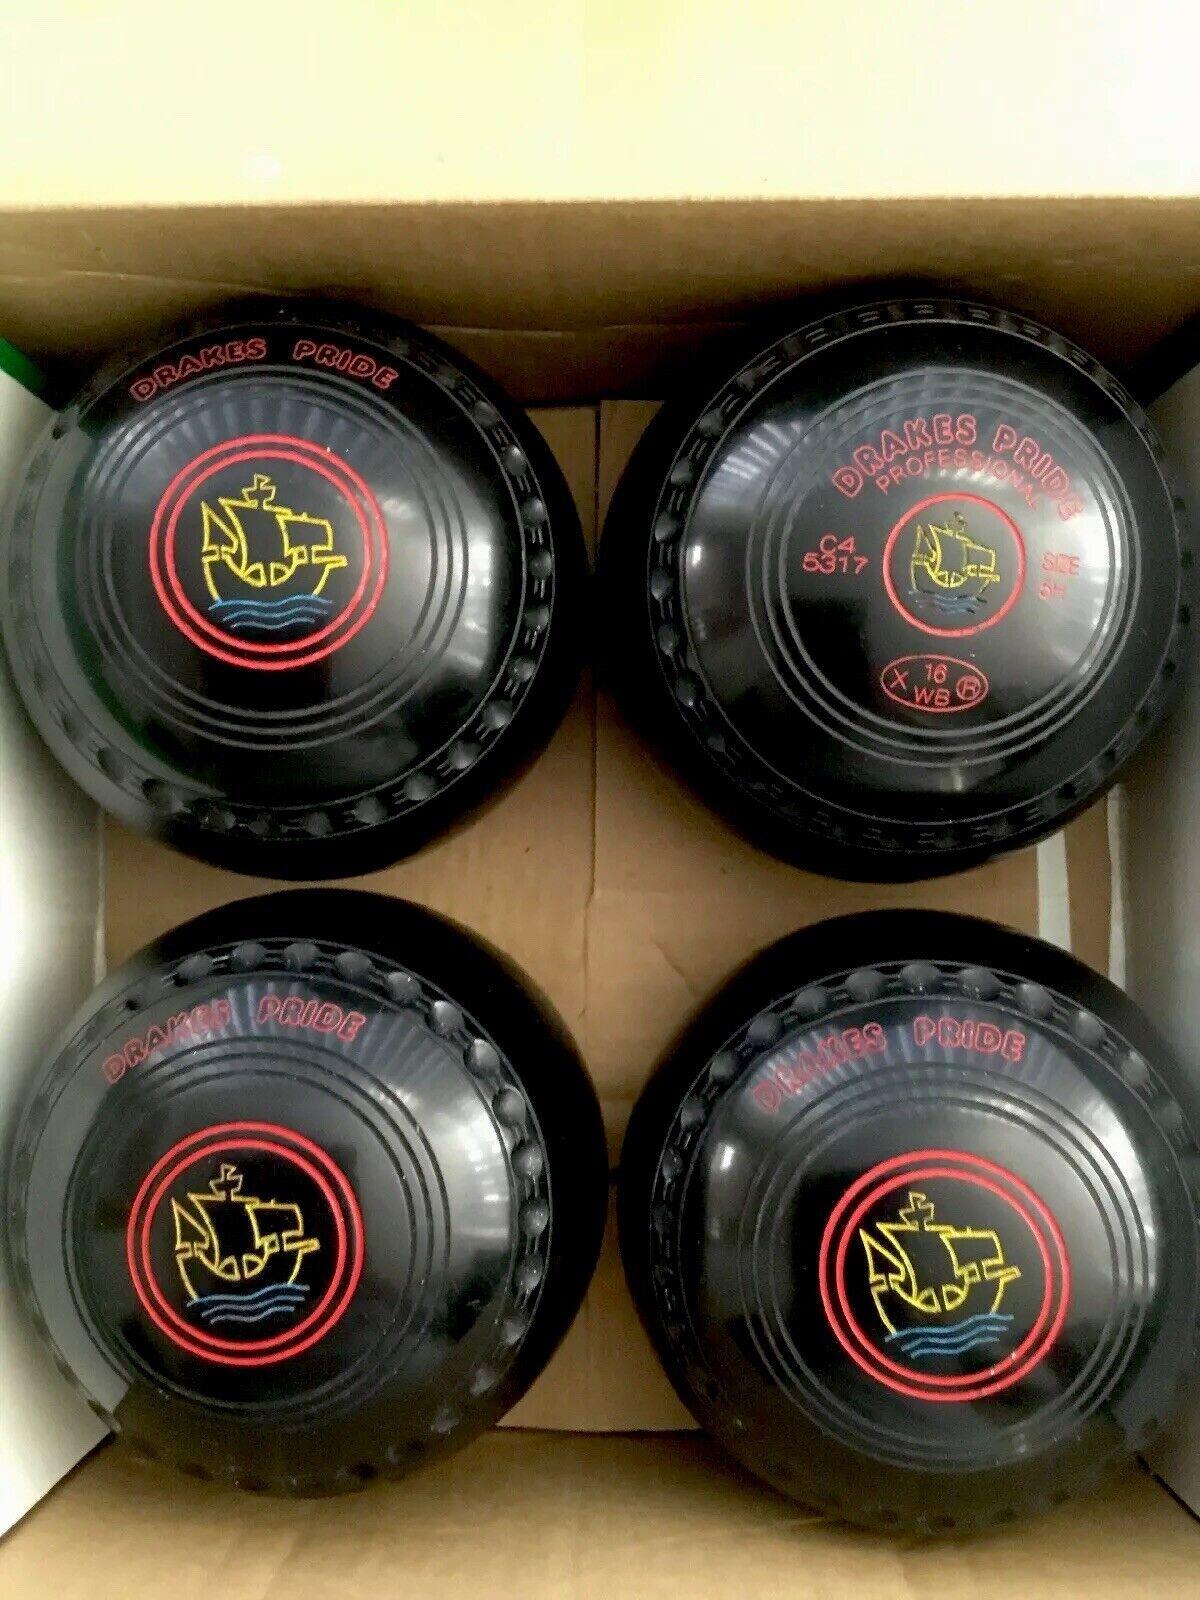 Drakes pride professional bowls 5H